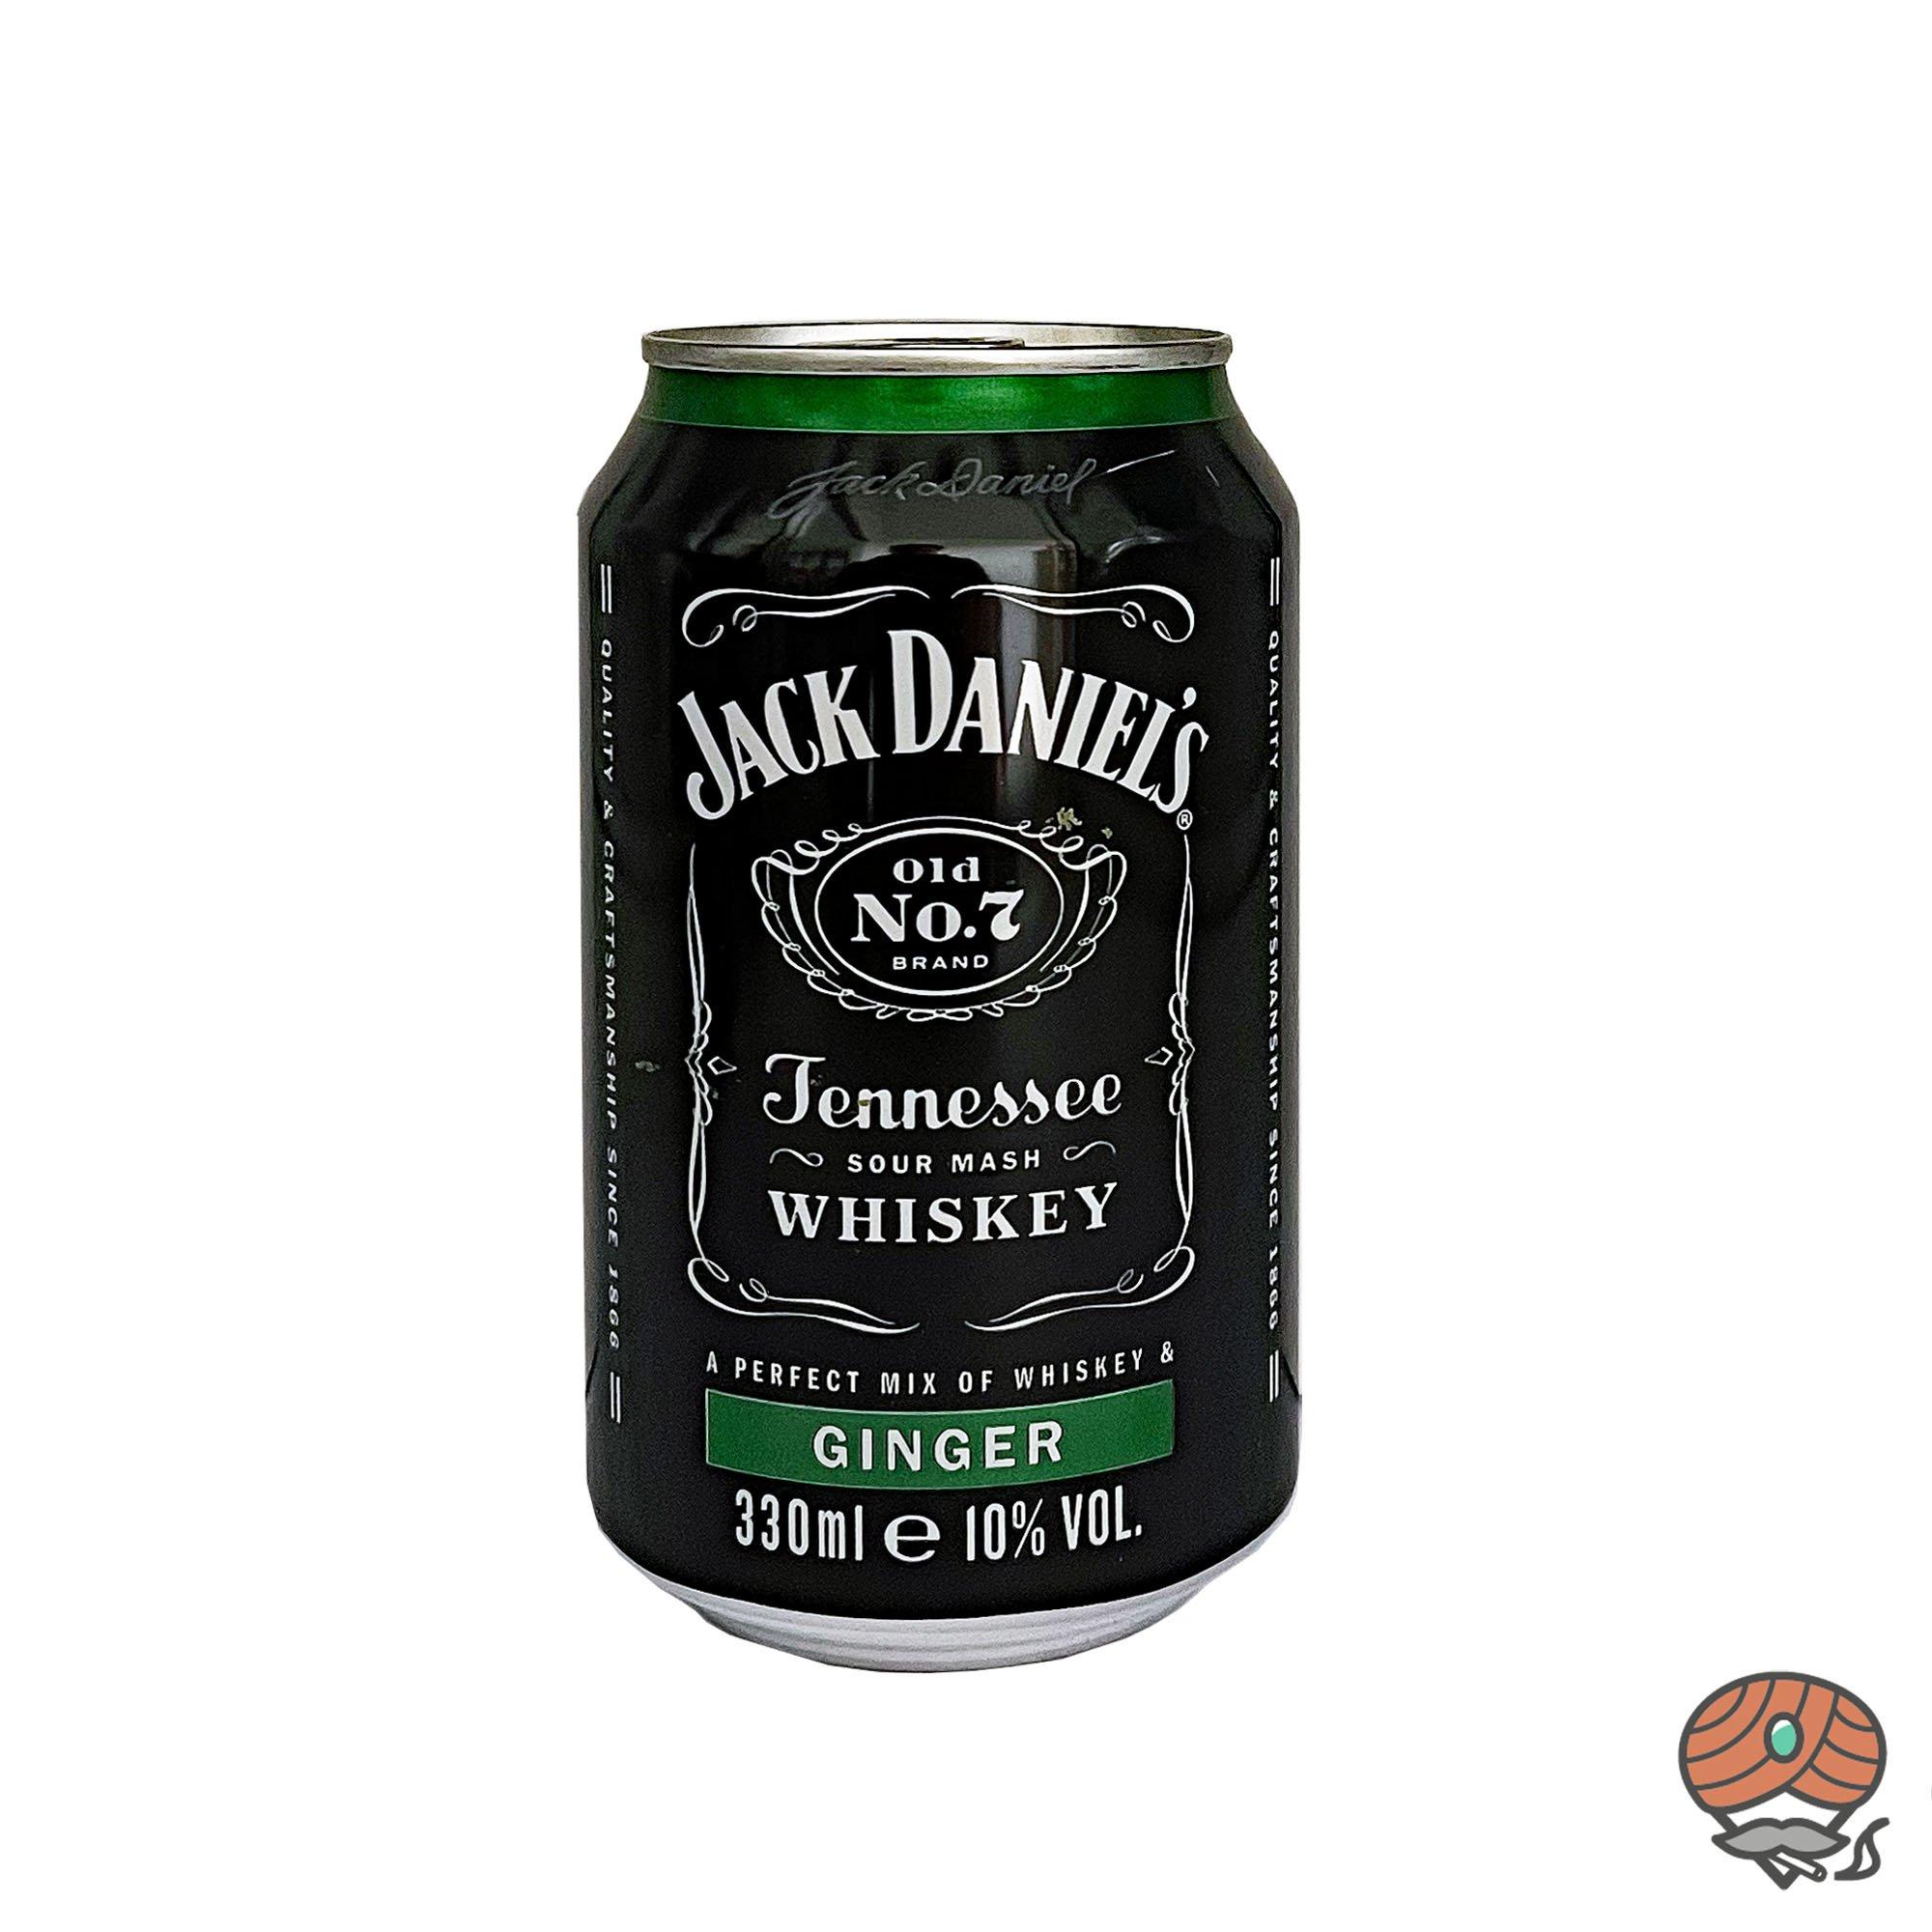 Jack Daniel´s Old No. 7 - Ginger Mixgetränk 0,33 l inkl.0,25 Euro Pfand (alc. 10% Vol)